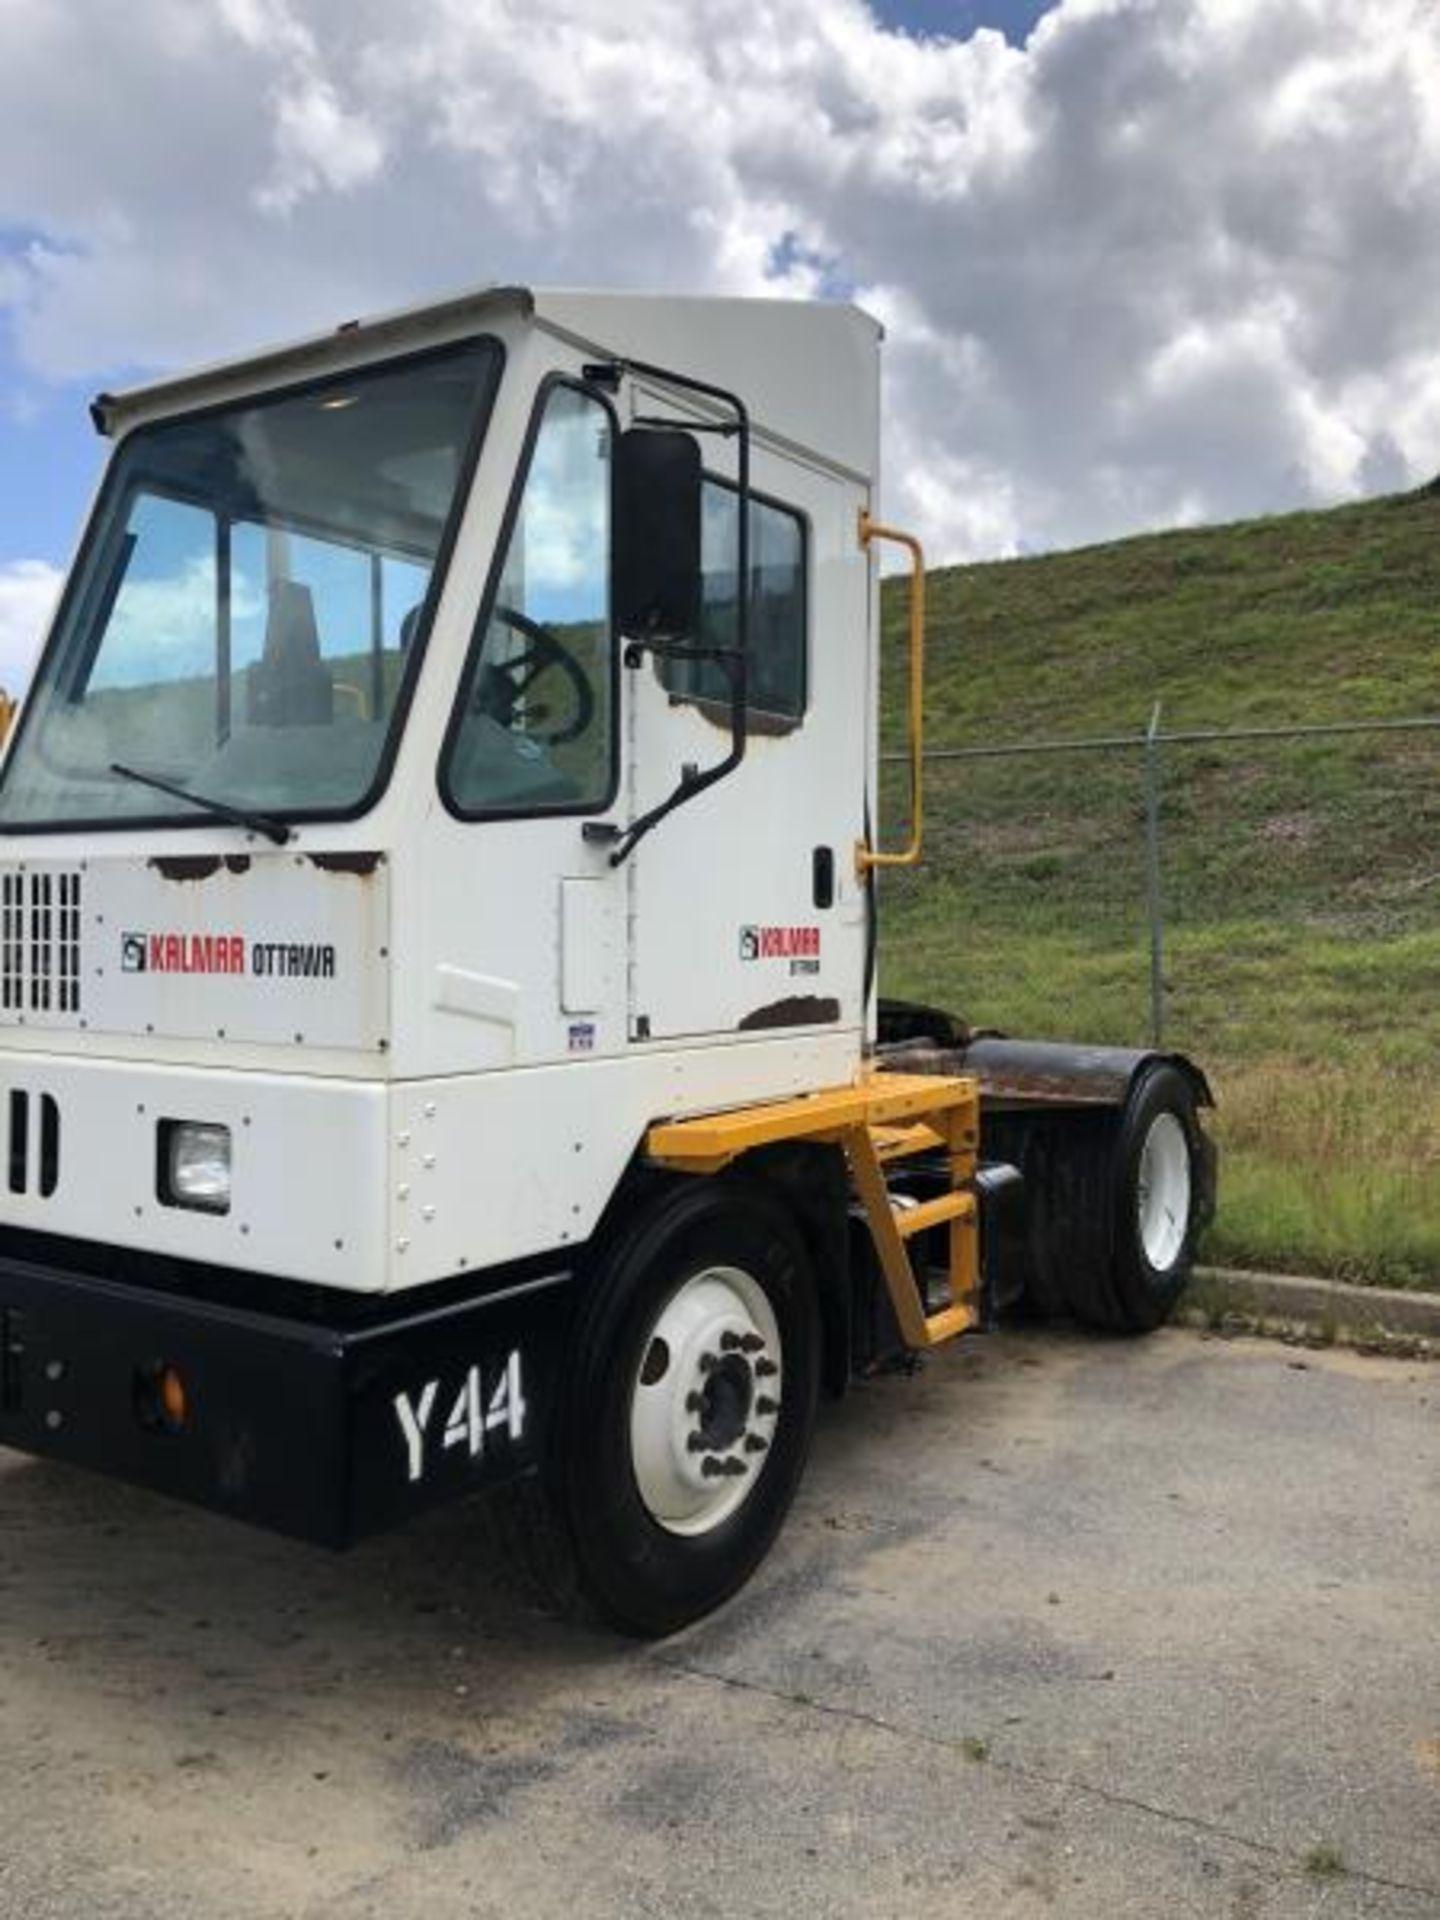 2015 Kalmar Ottawa 4x2 Yard Truck , SN: 338838 3,710.3 Hours, 2,817 Miles - Image 15 of 28